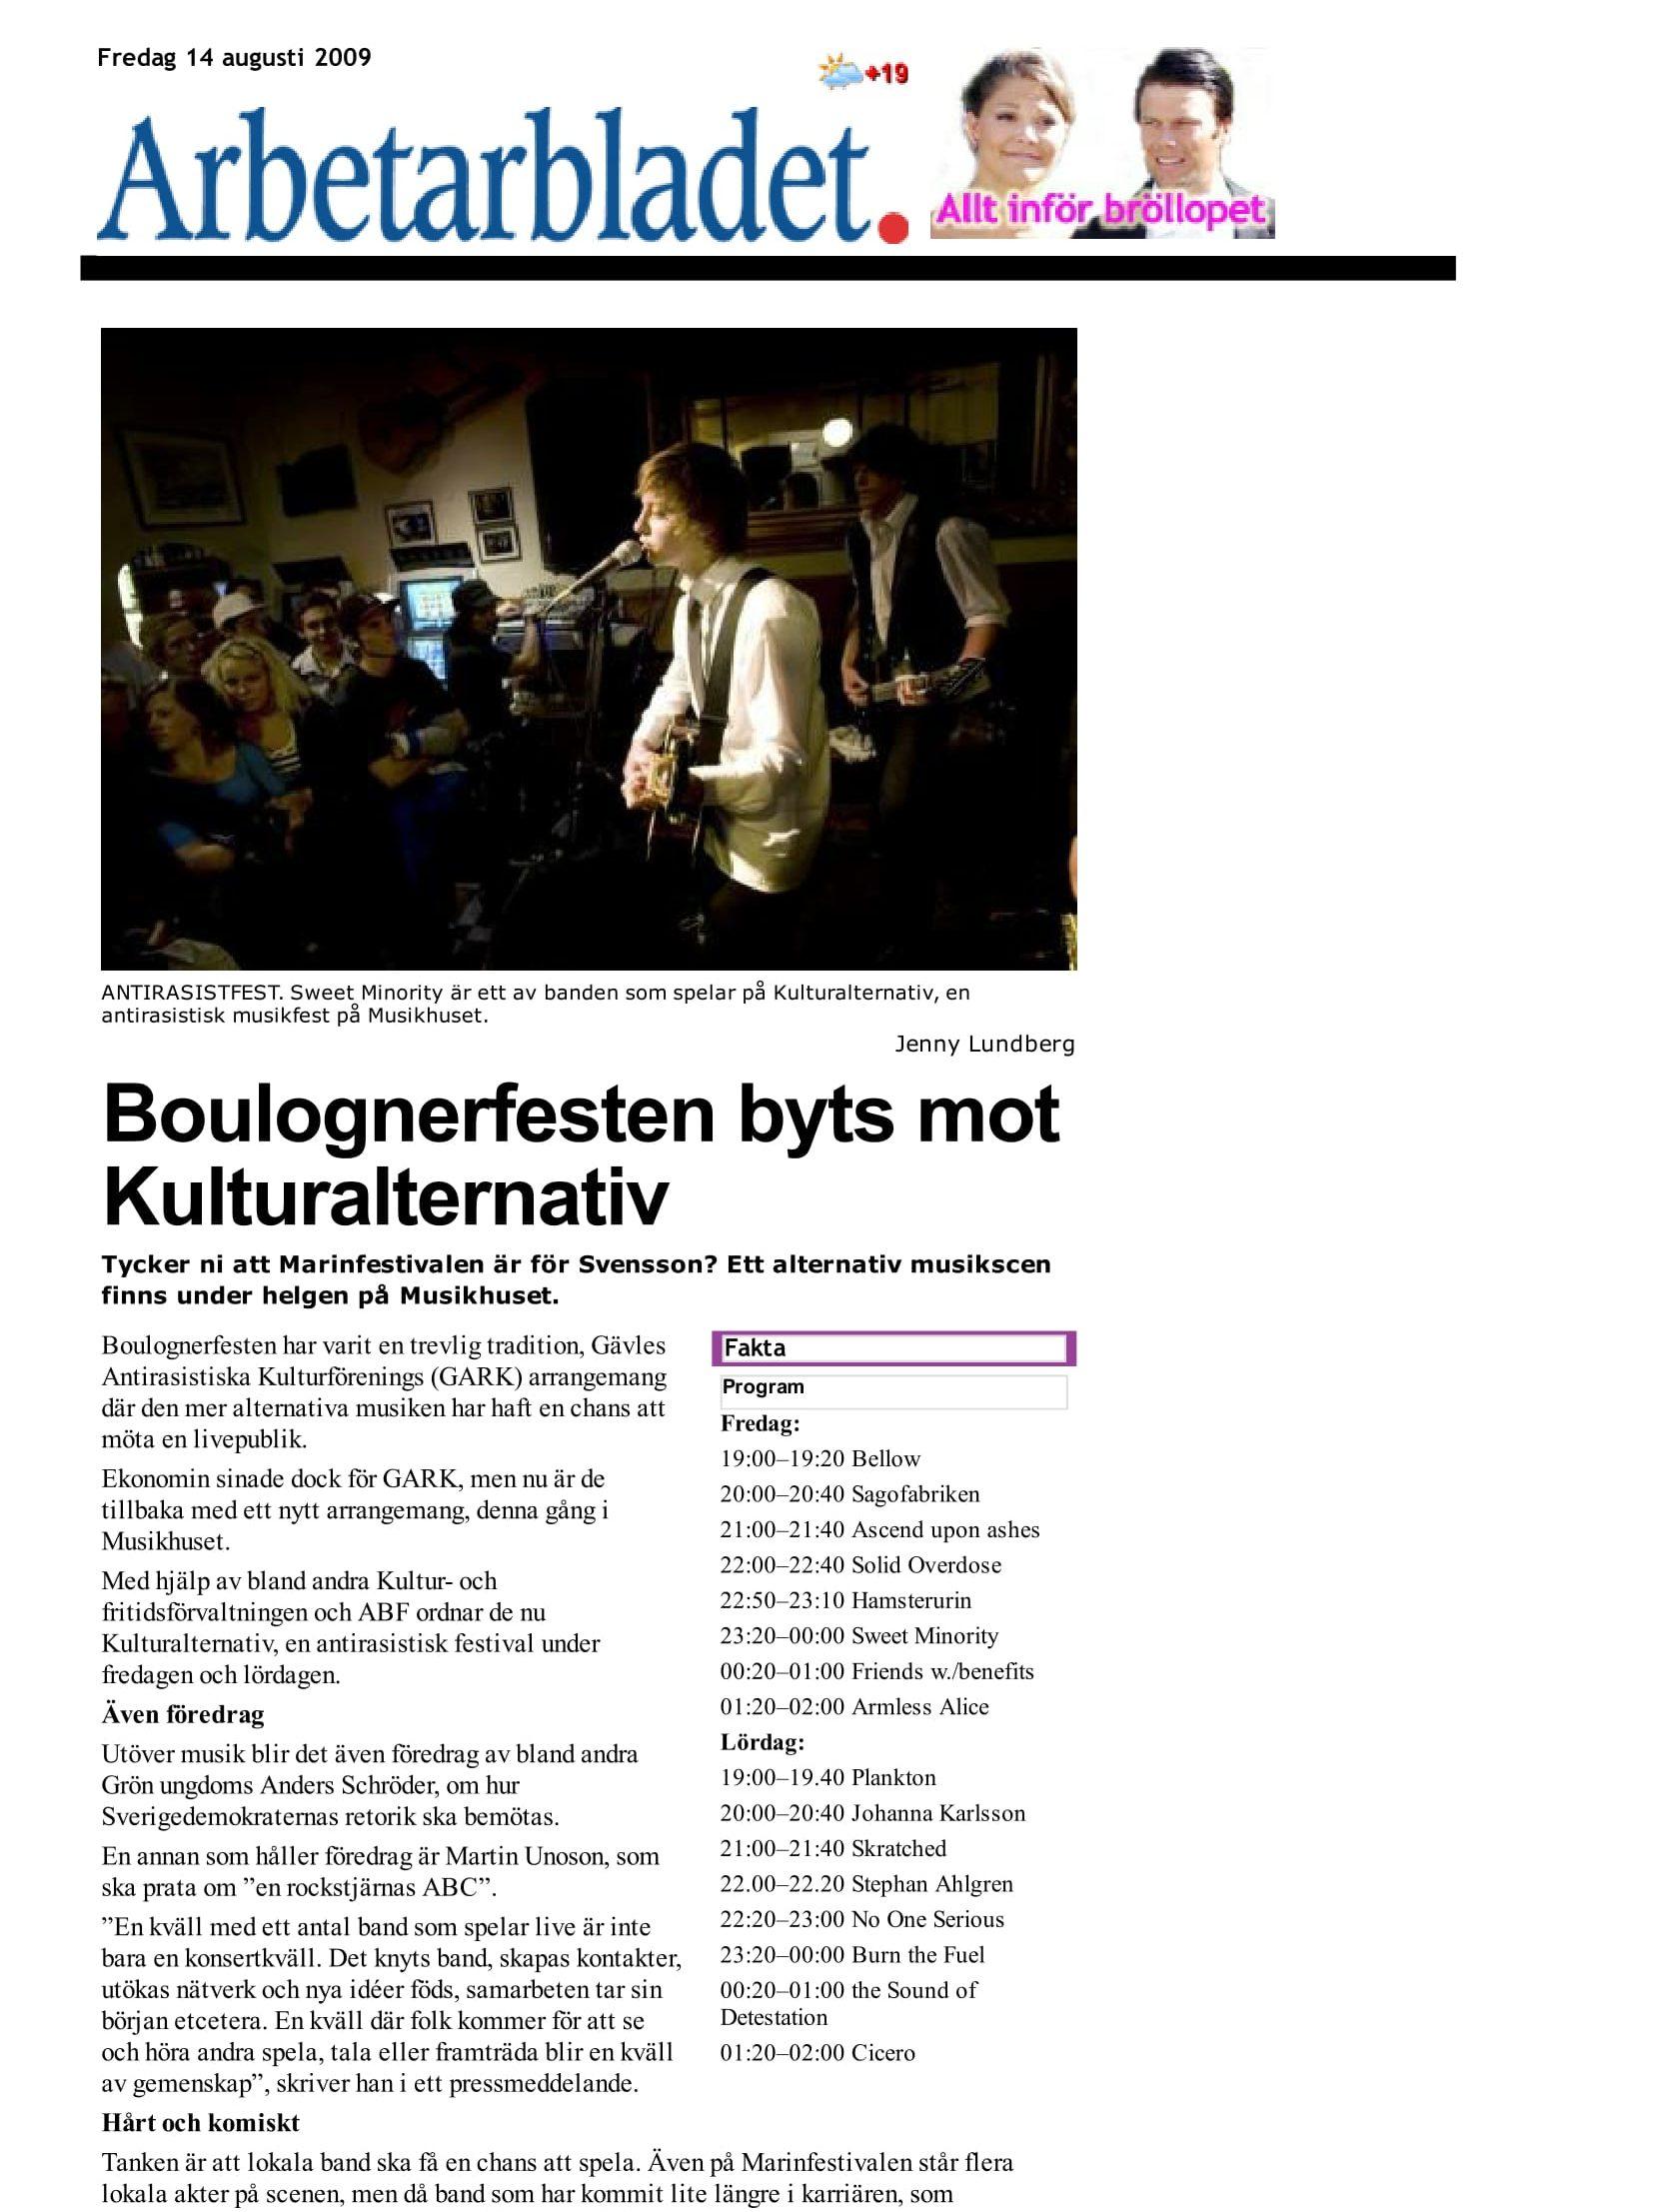 boulognerfesten-byts-mot-kulturalternativ-noje-www-arbetarbladet-1